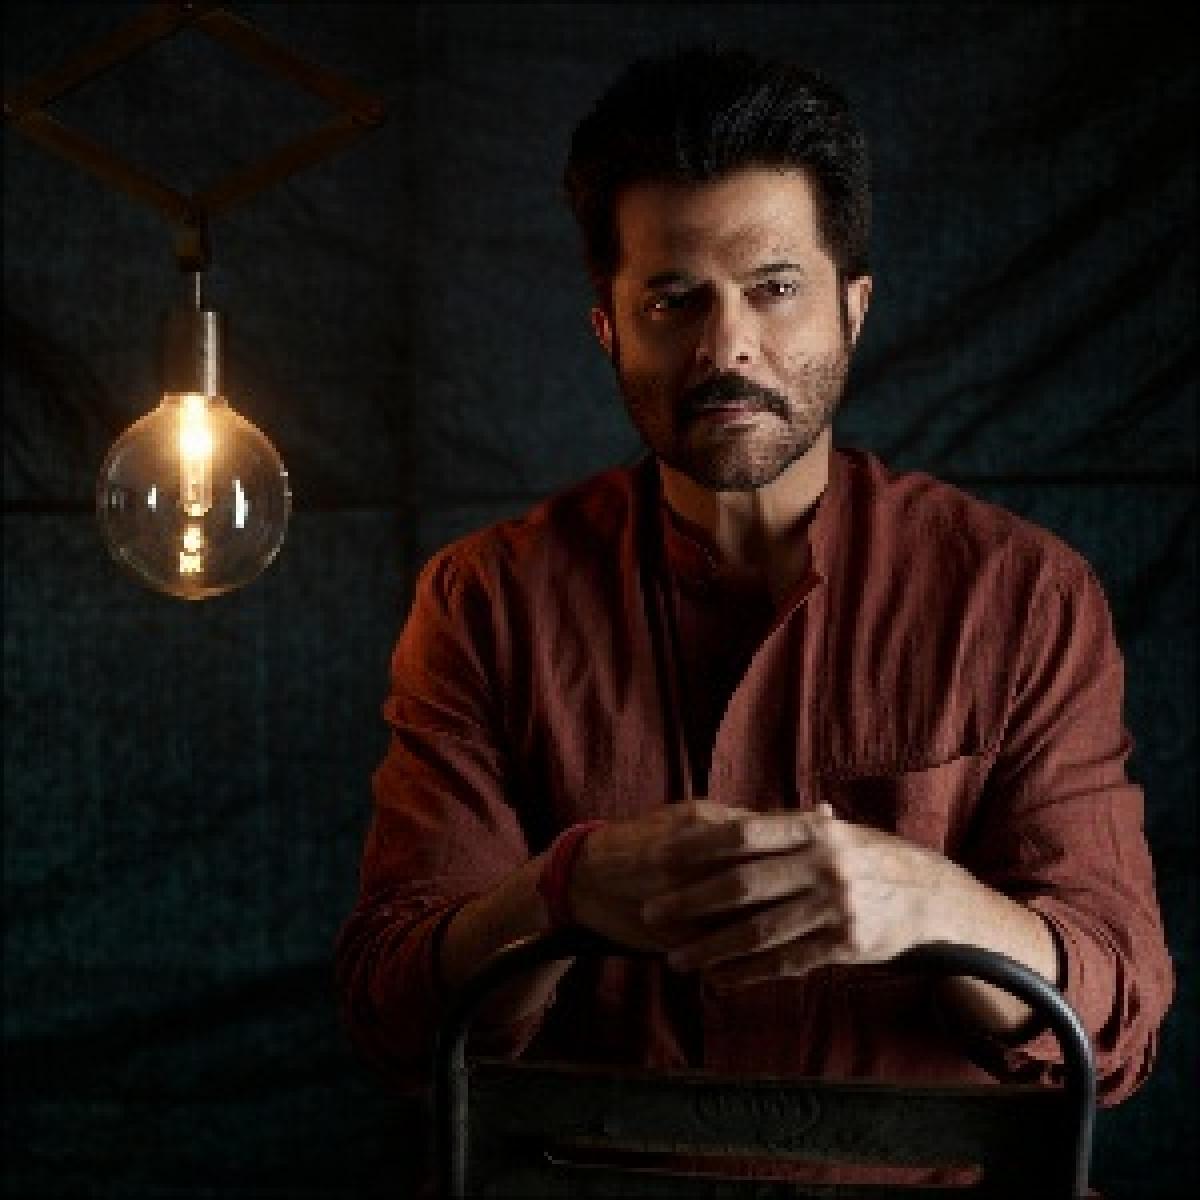 Anil Kapoor cast in Amazon's upcoming sci-fi drama pilot